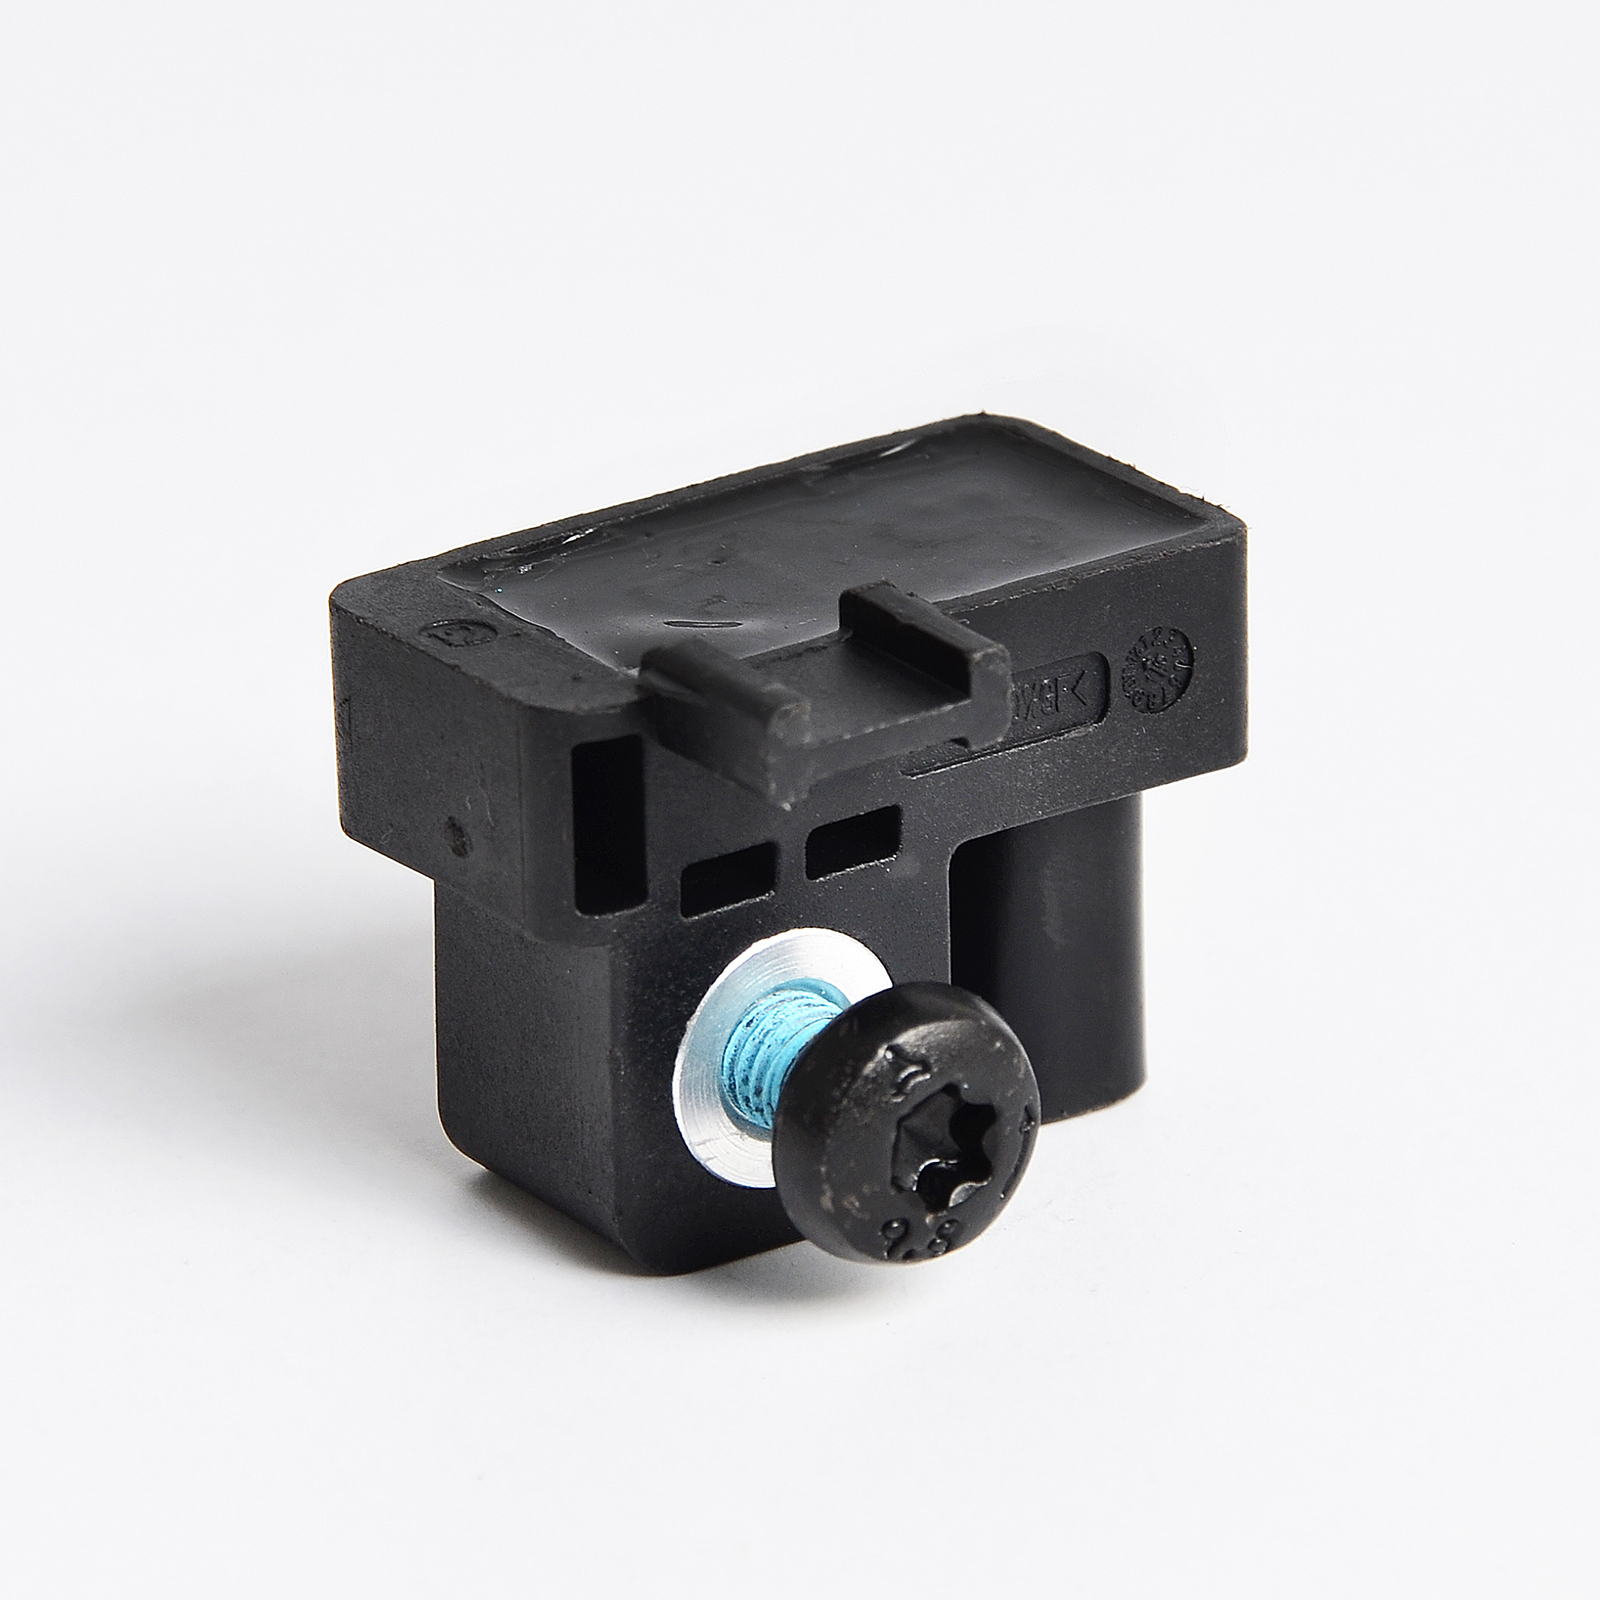 590-225 Front Bumper Impact Sensor for GMC Sierra//Yukon Chevrolet Silverado